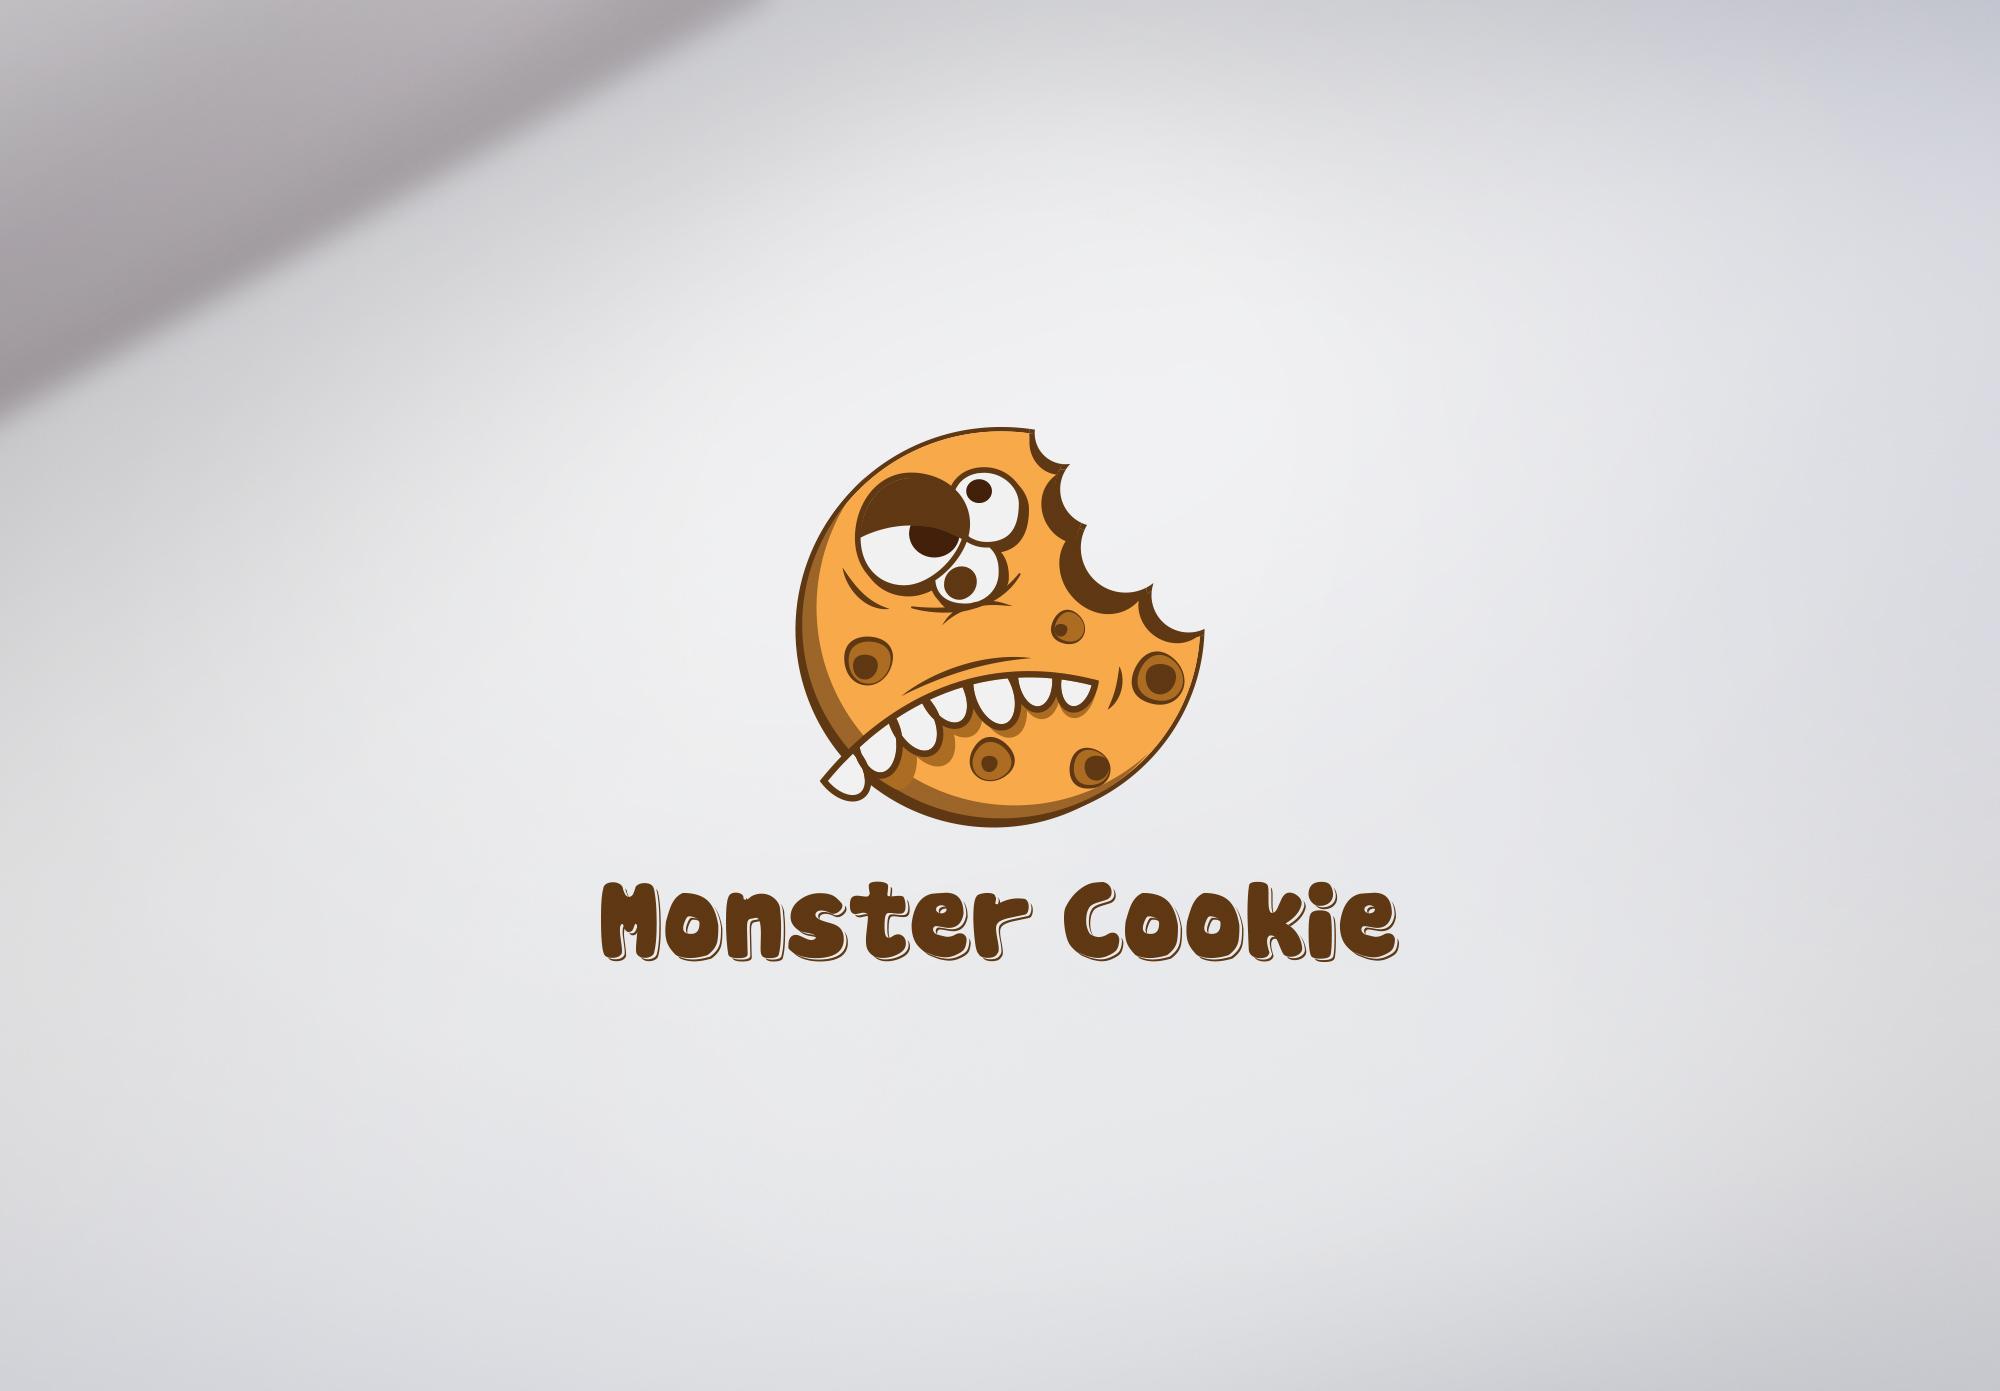 4 monster cookie